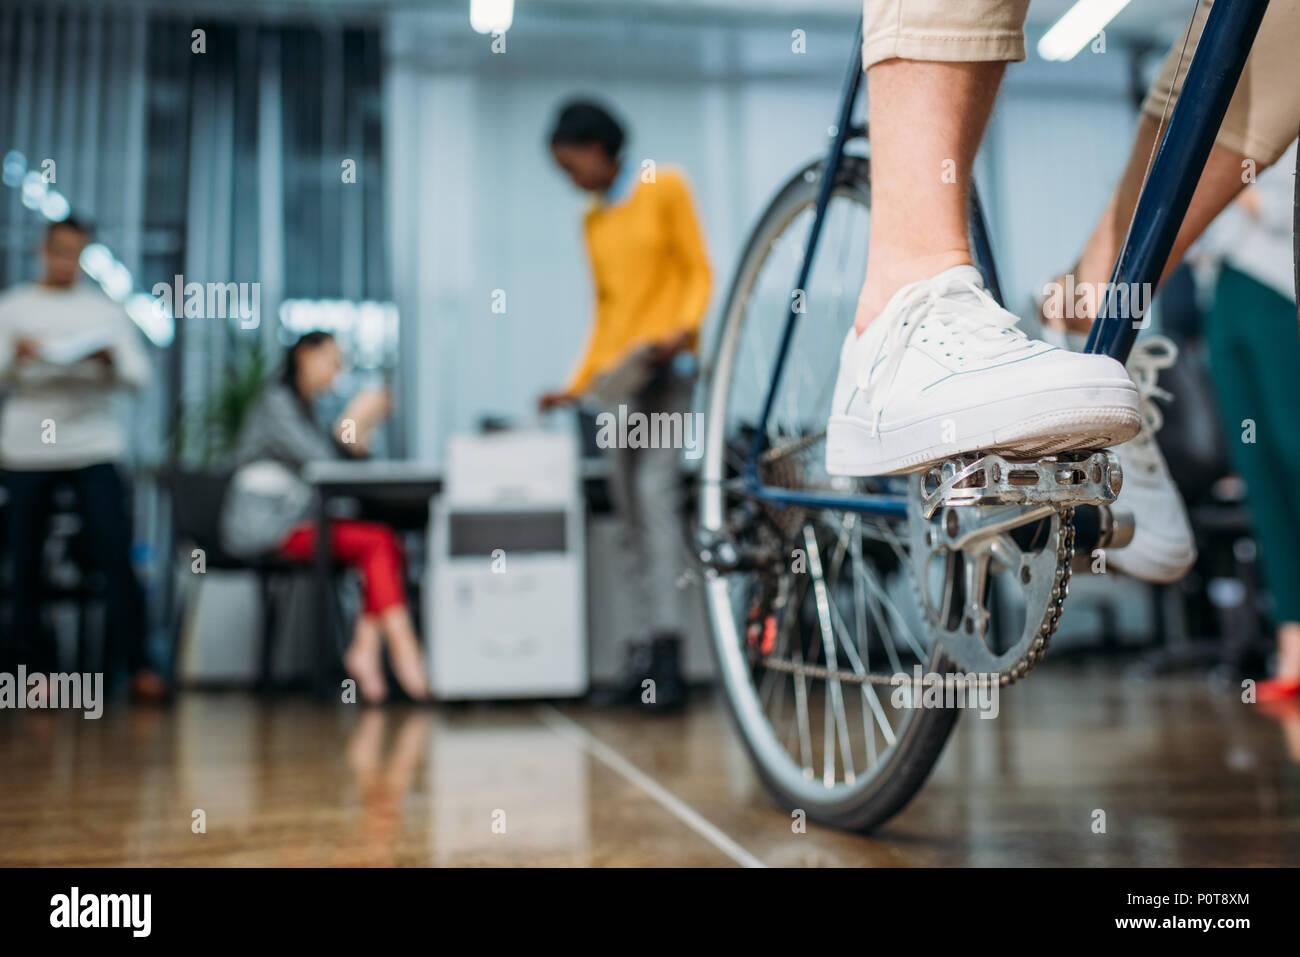 Captura recortada de persona montando bicicleta en oficina moderna Foto de stock